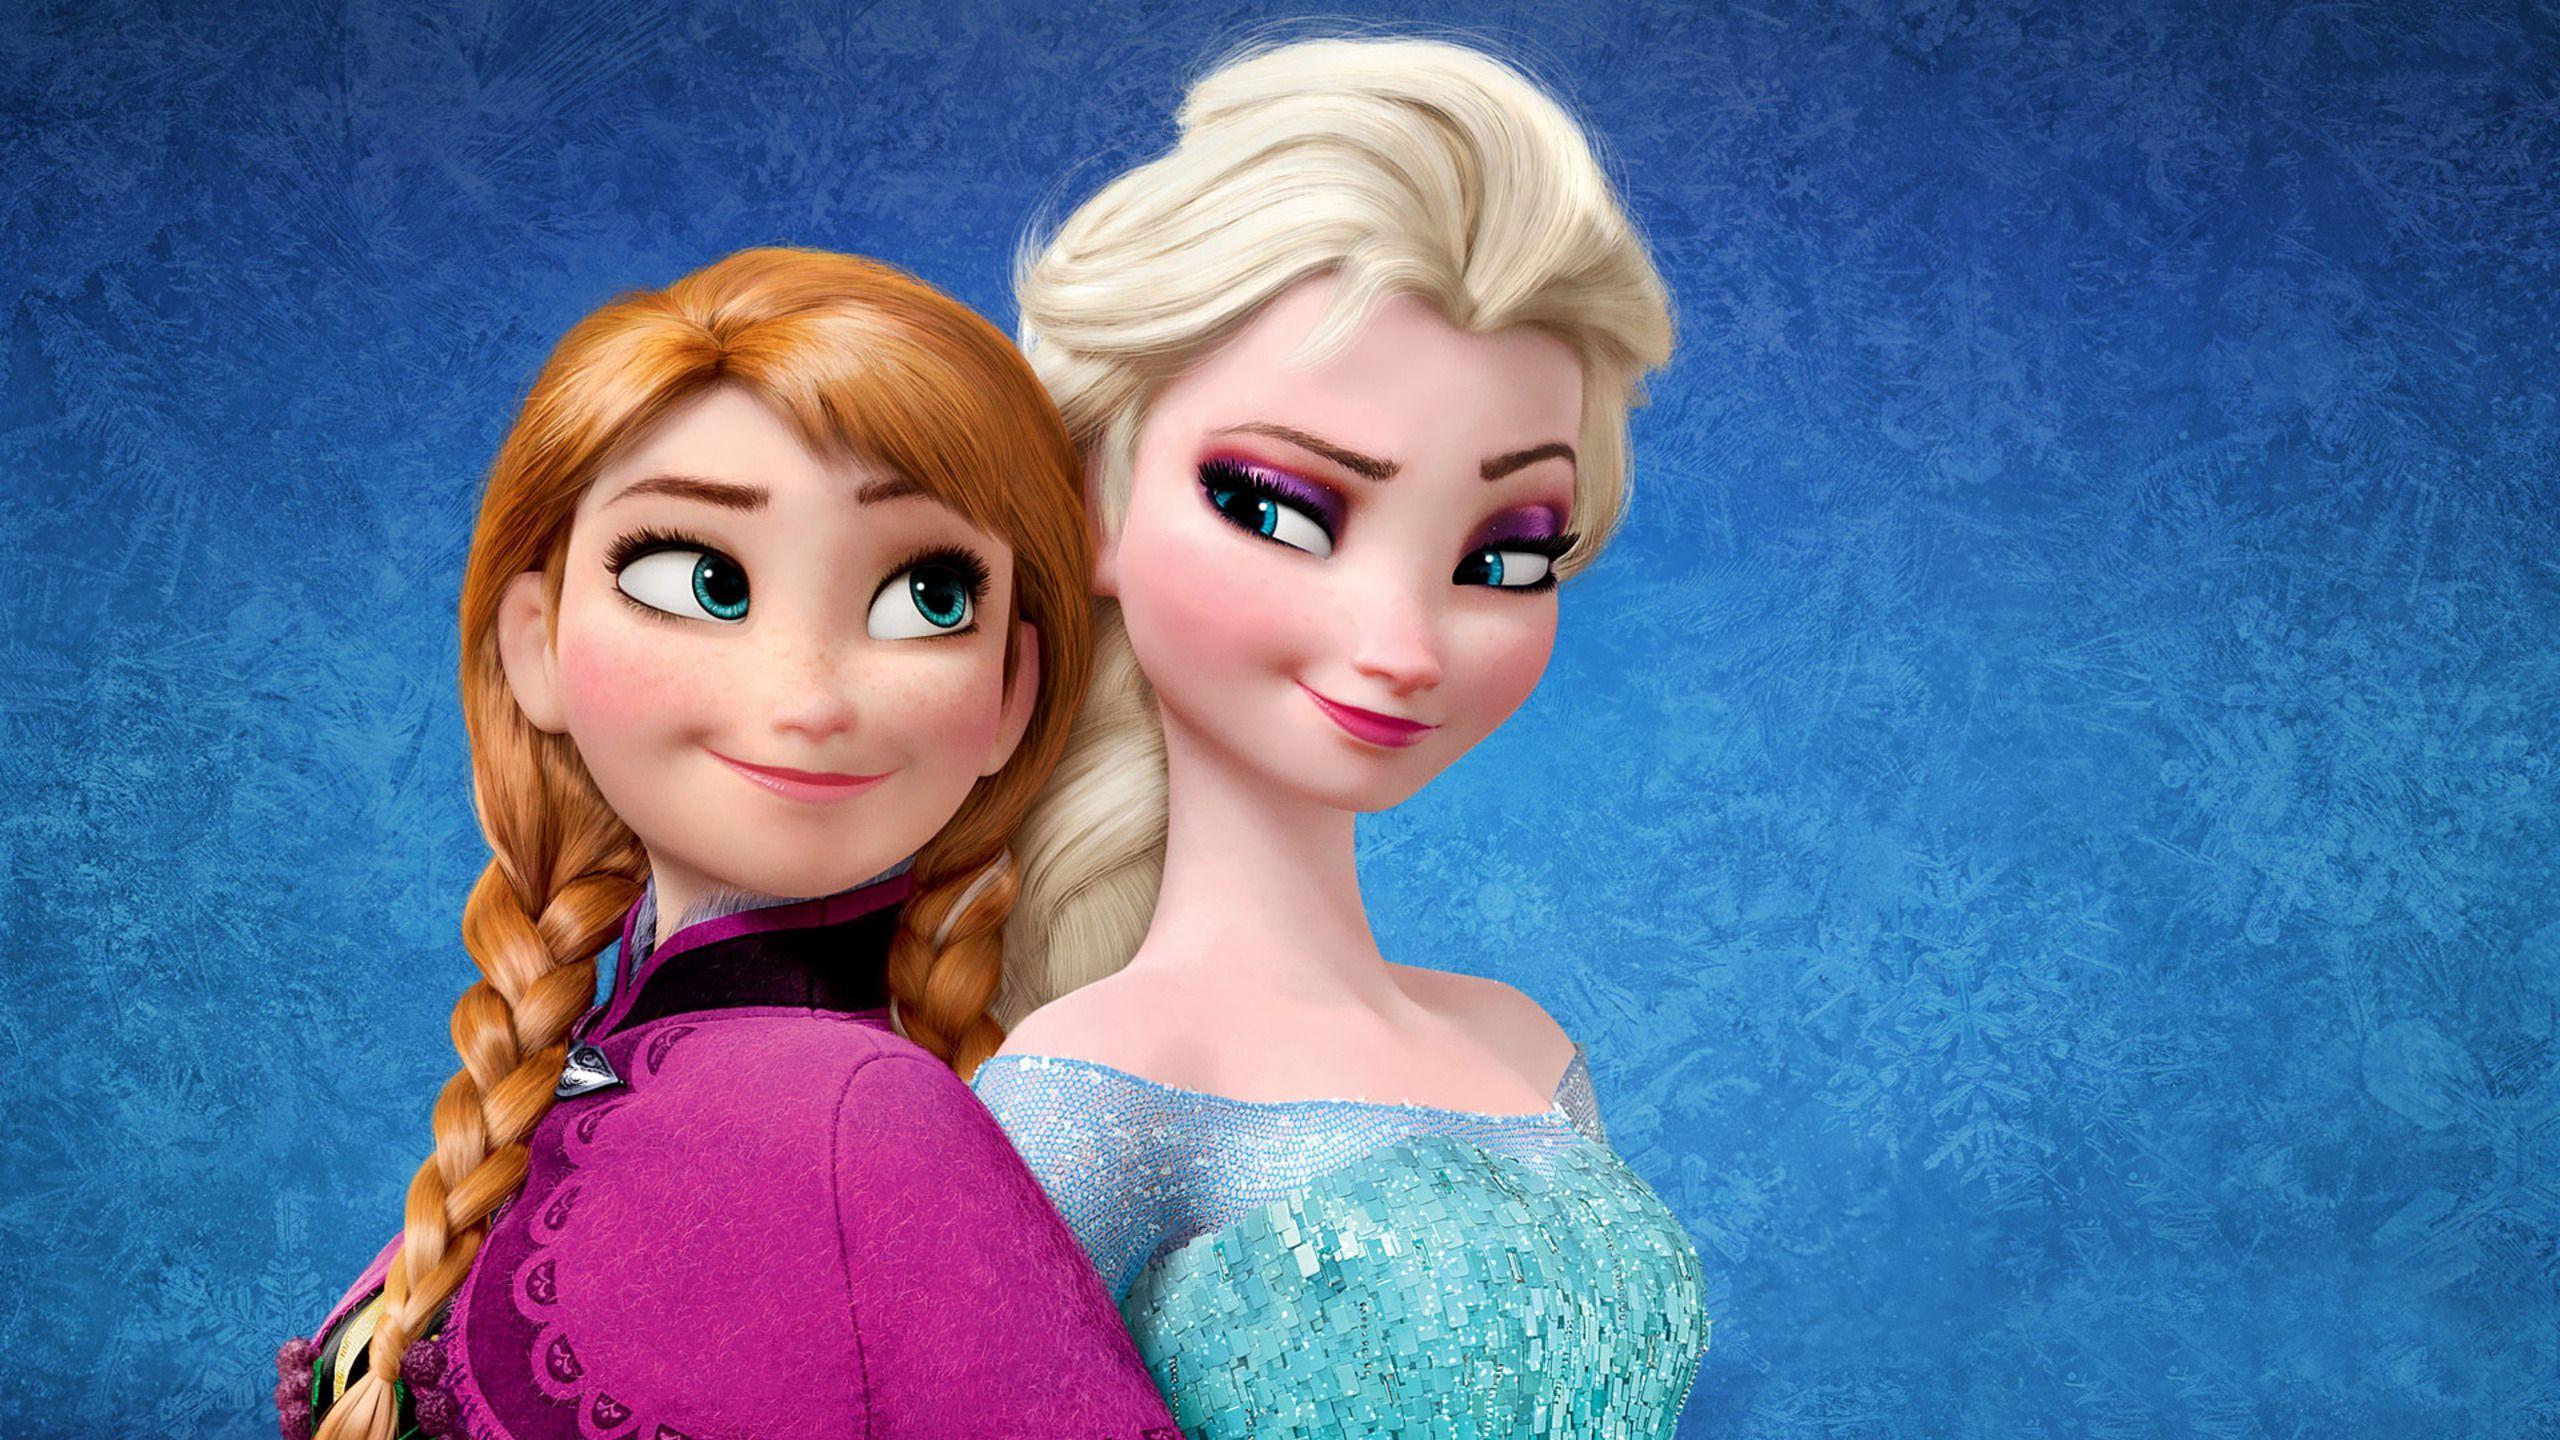 frozen elsa | frozen elsa wallpaper | frozen | pinterest | elsa